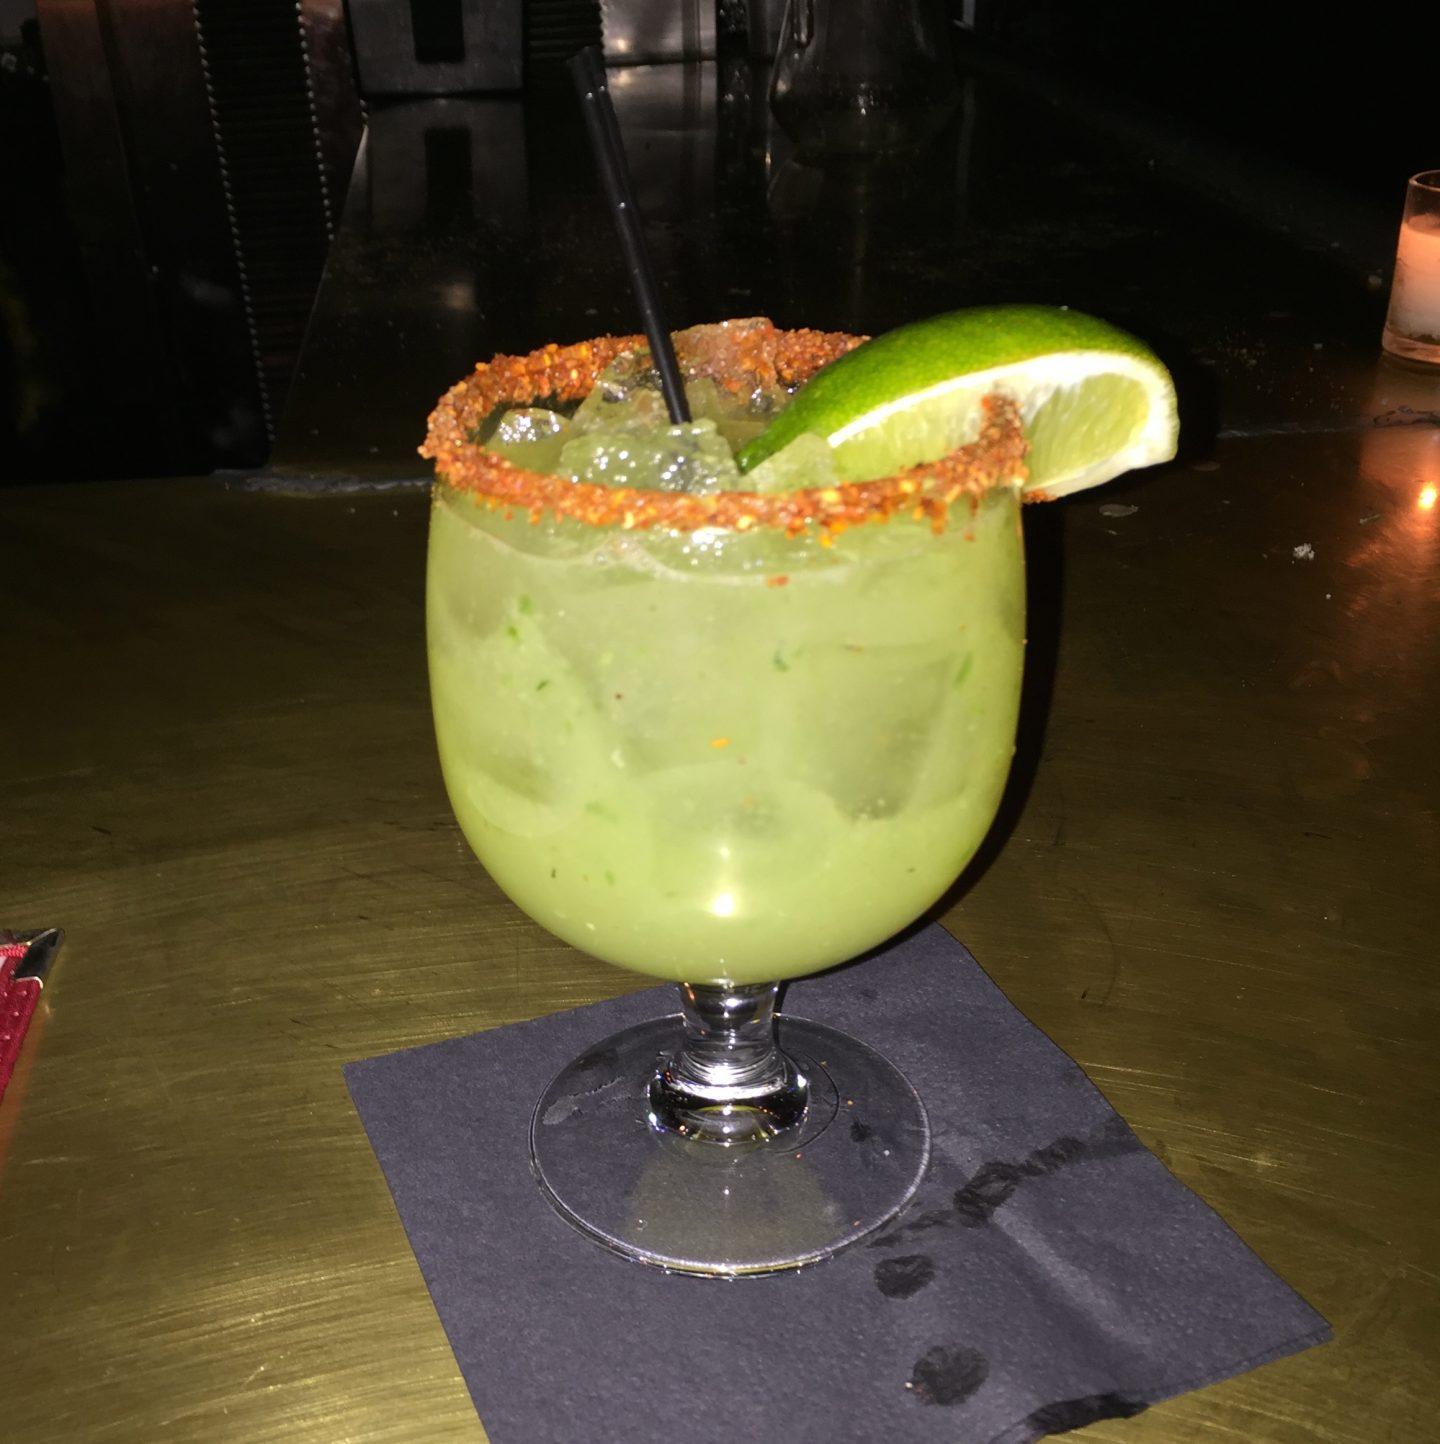 Favourite cocktail ever. La Esquina, Kenmare St Soho, New York